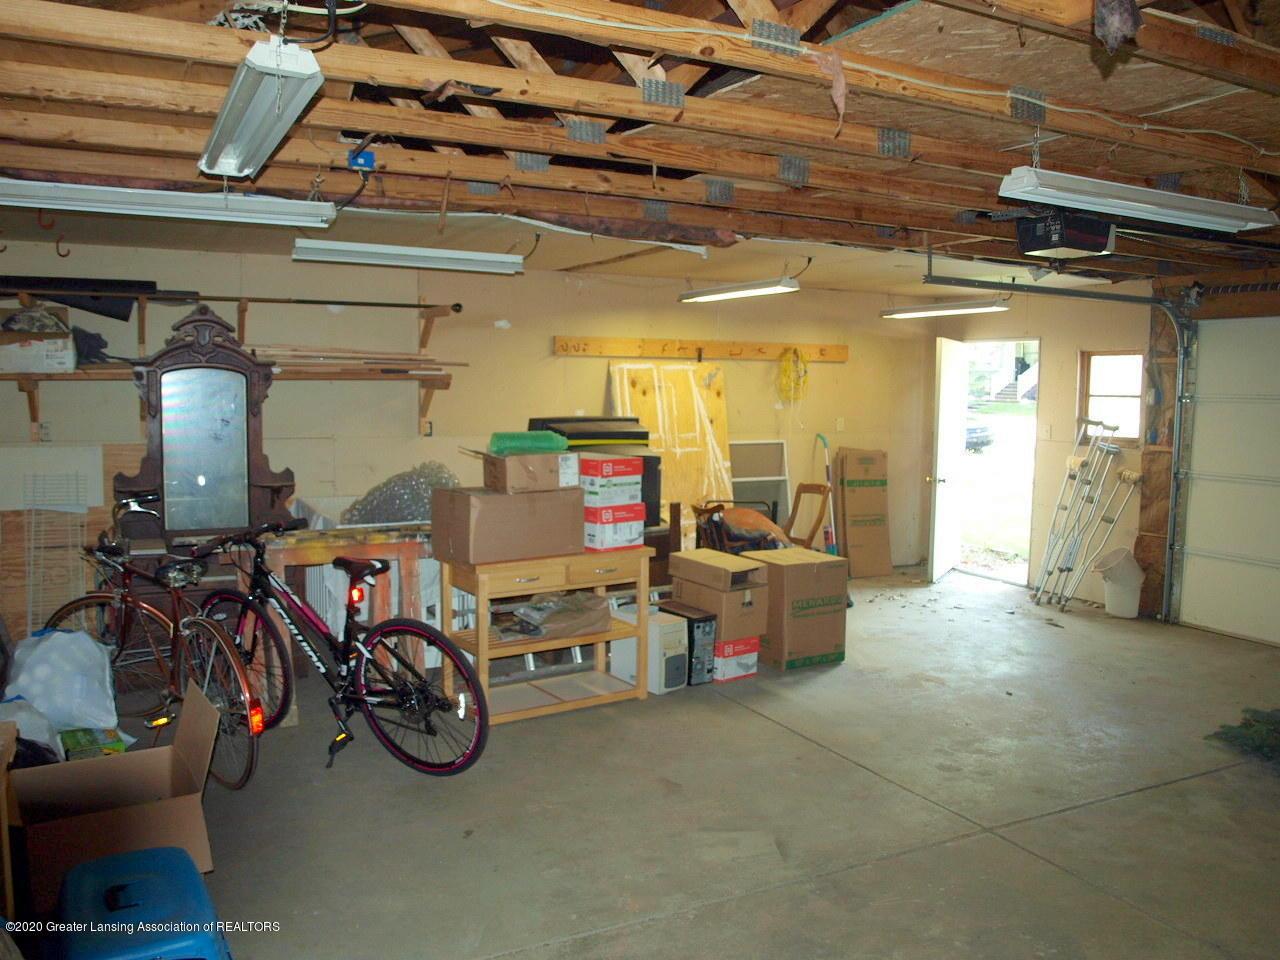 300 S Swegles St - garage - 28